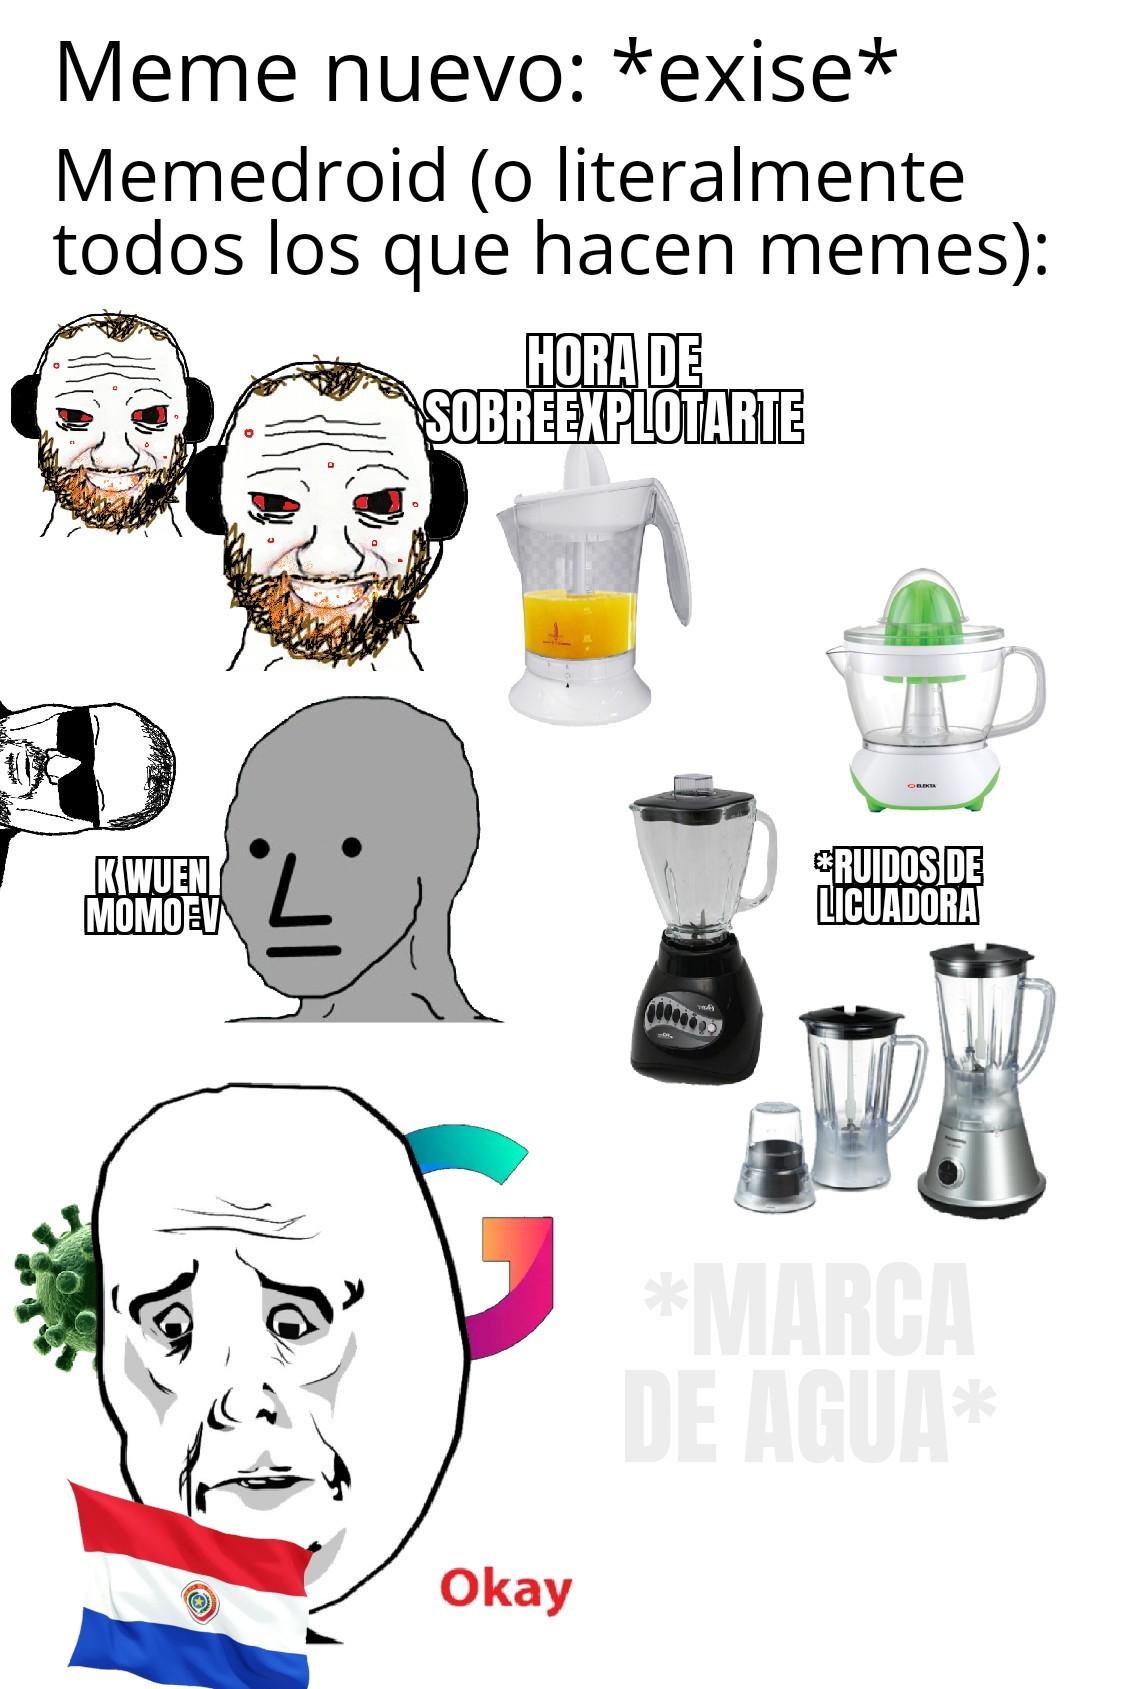 Momosdroid momento - meme